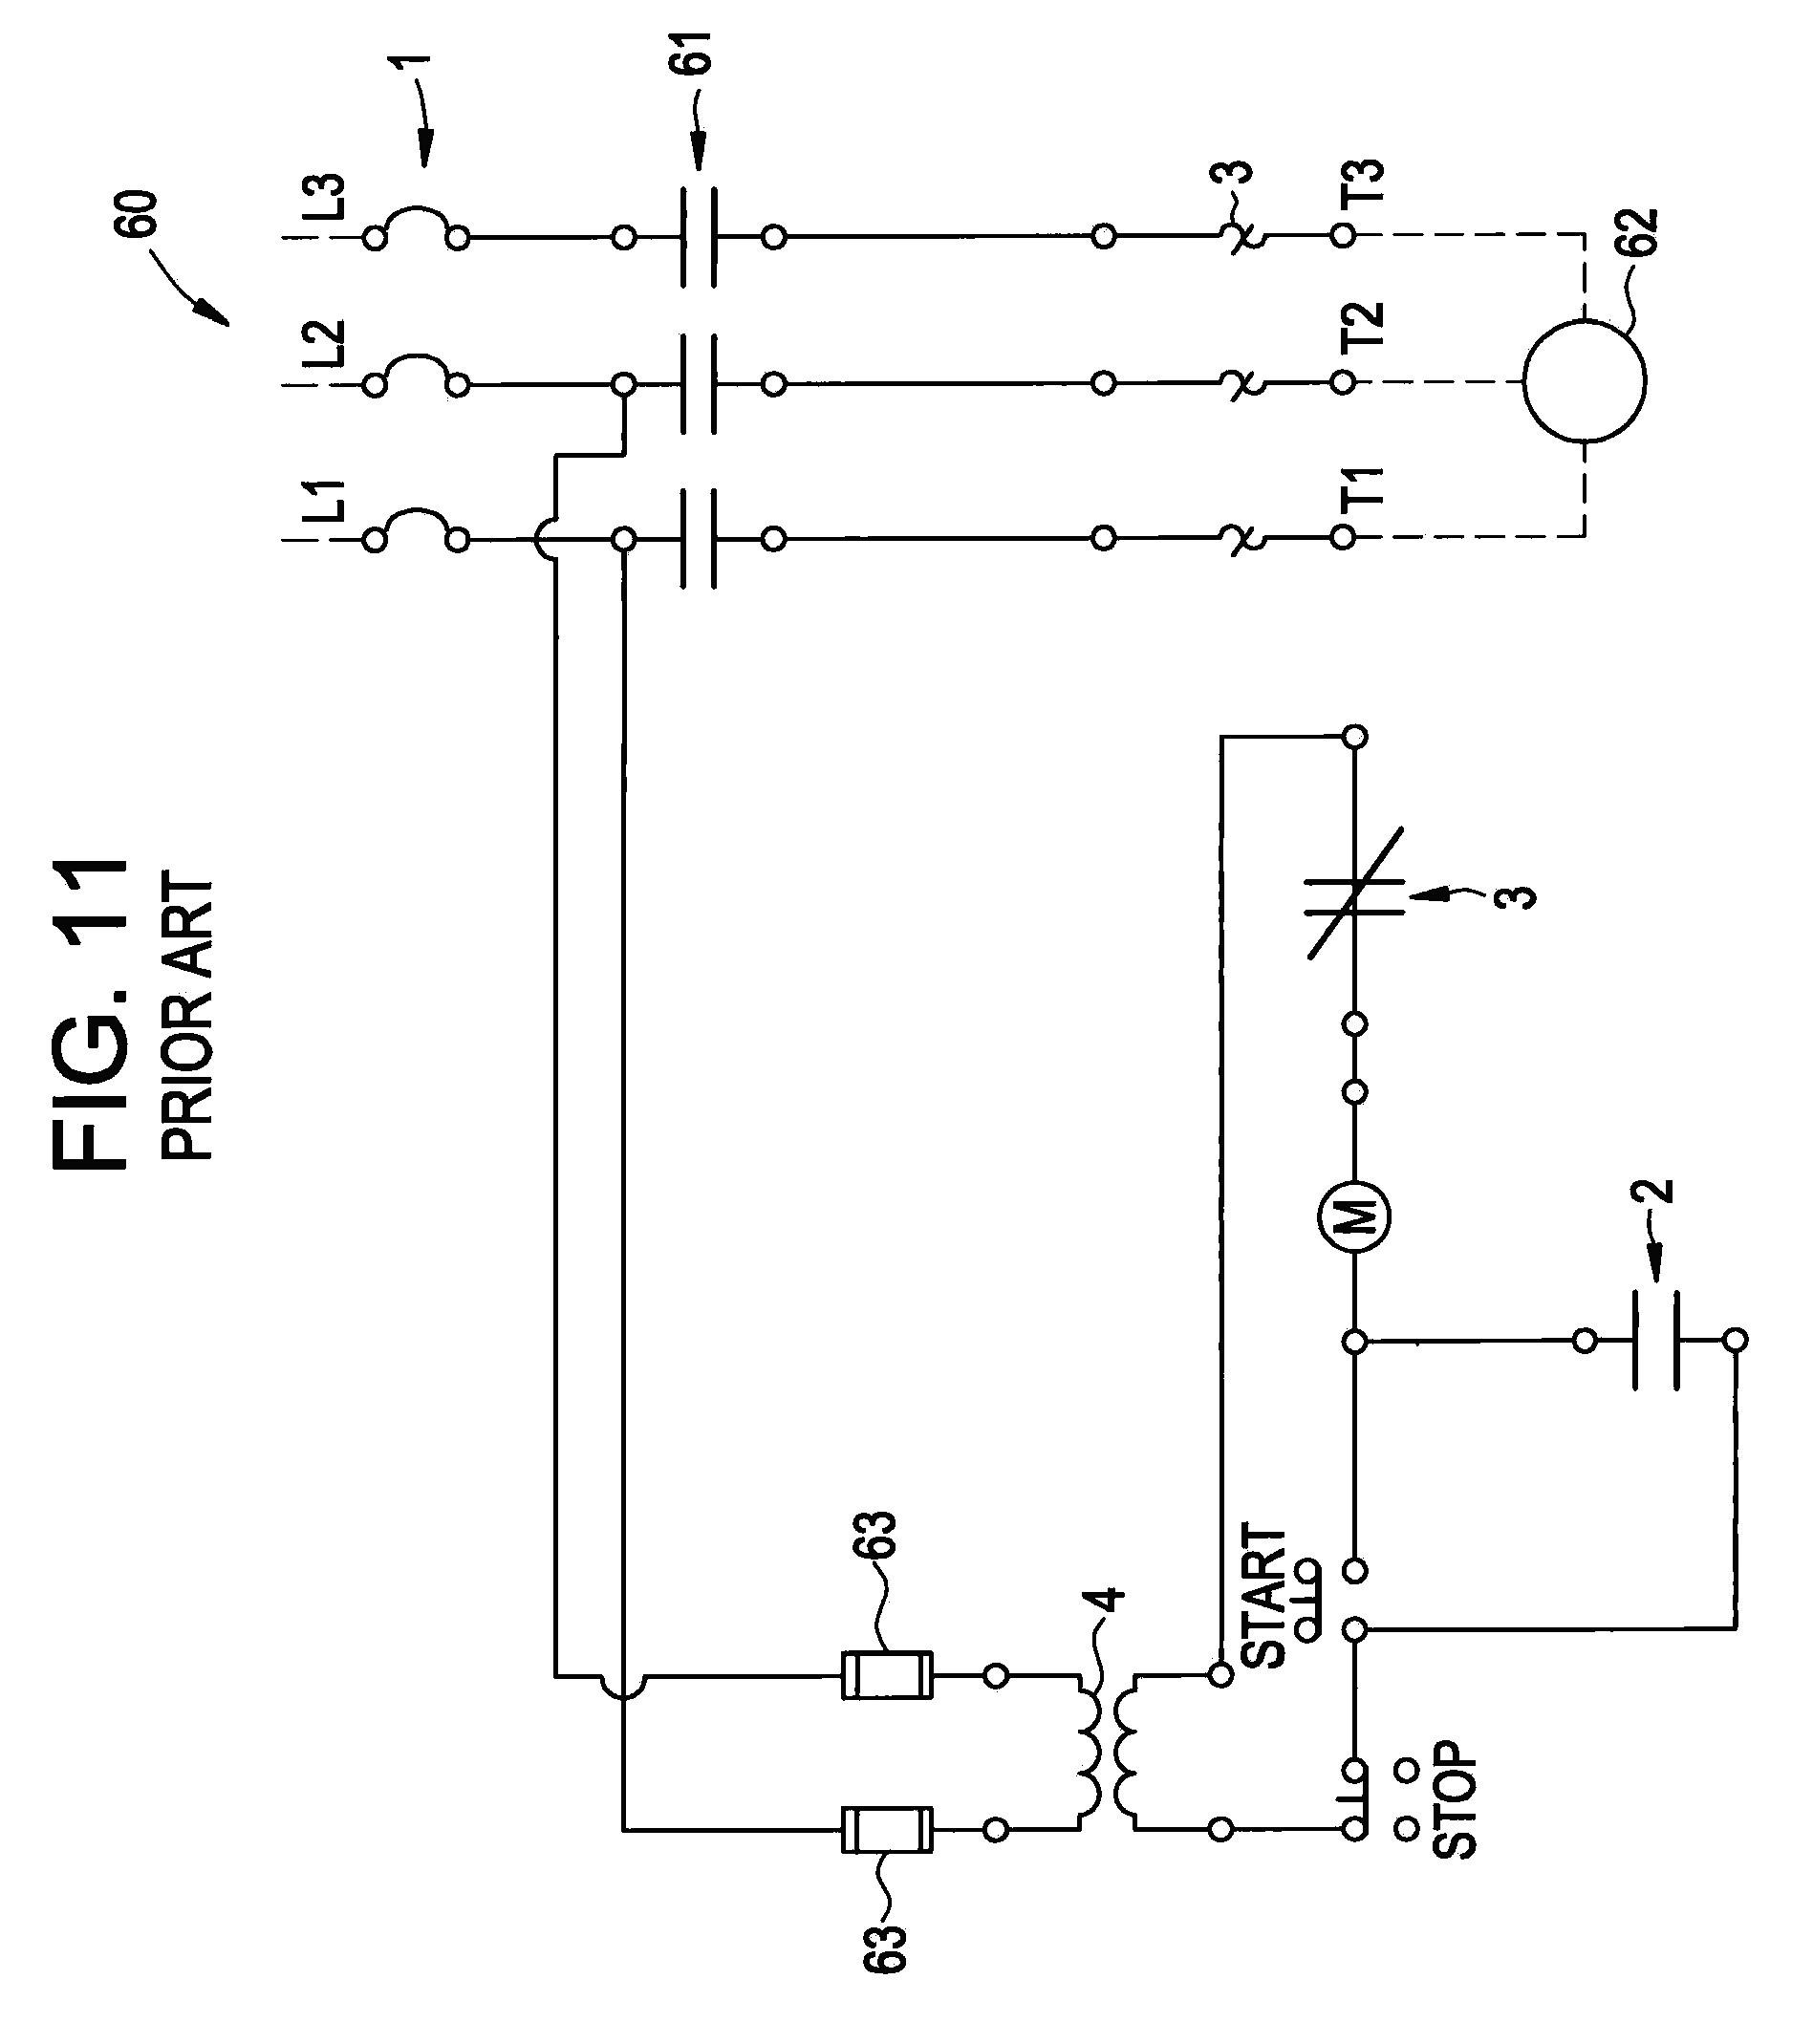 Cutler Hammer Motor Starter Wiring Diagram 2 Cutler Hammer Motor Starter Wiring Diagram Download Of Cutler Hammer Motor Starter Wiring Diagram 2